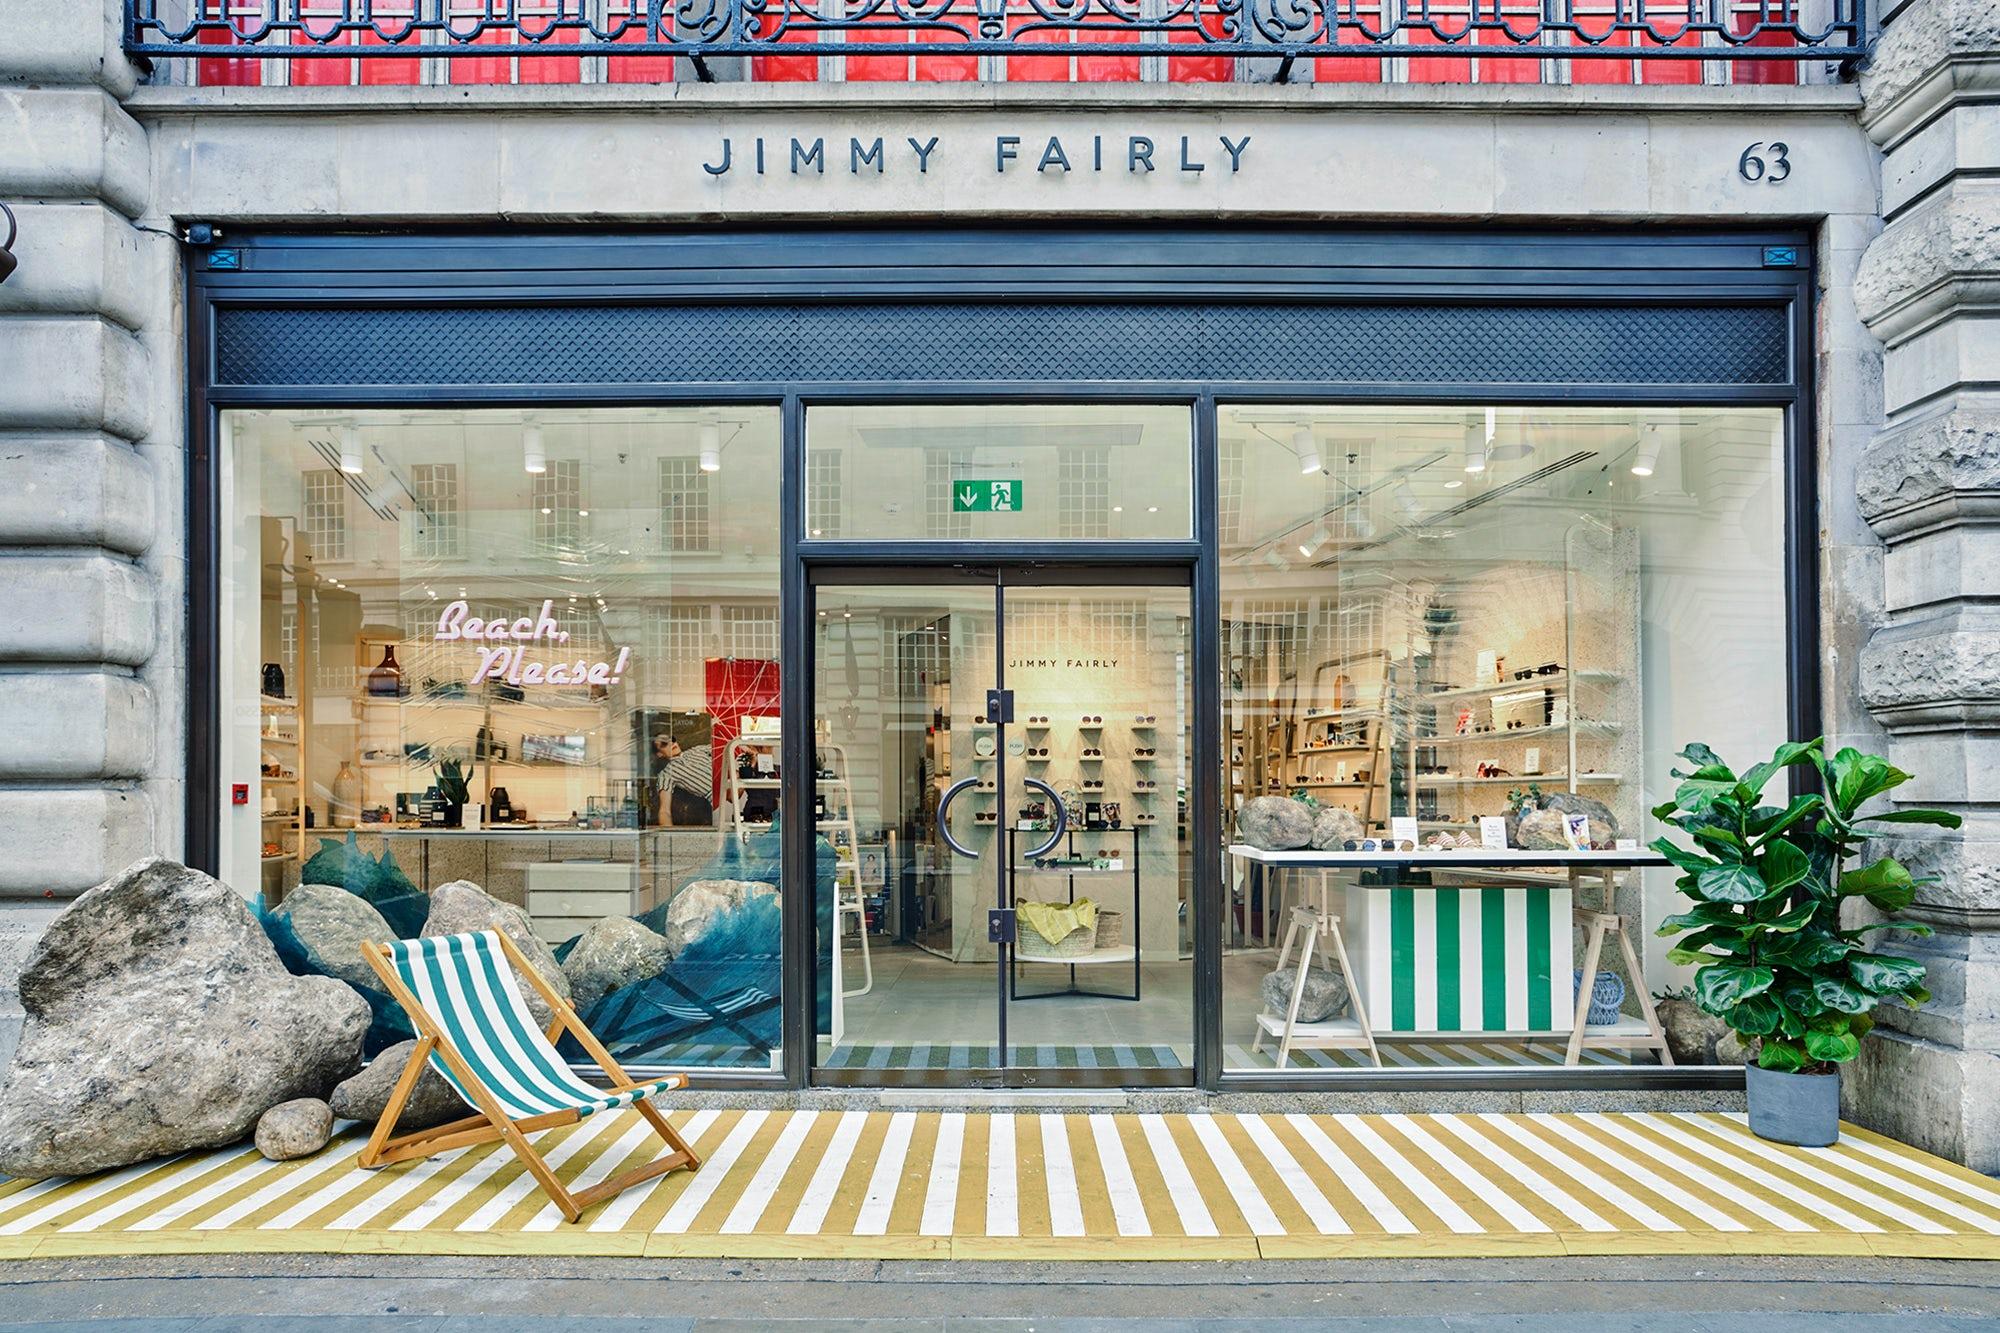 Eyewear Brand Jimmy Fairly Plots UK Expansion